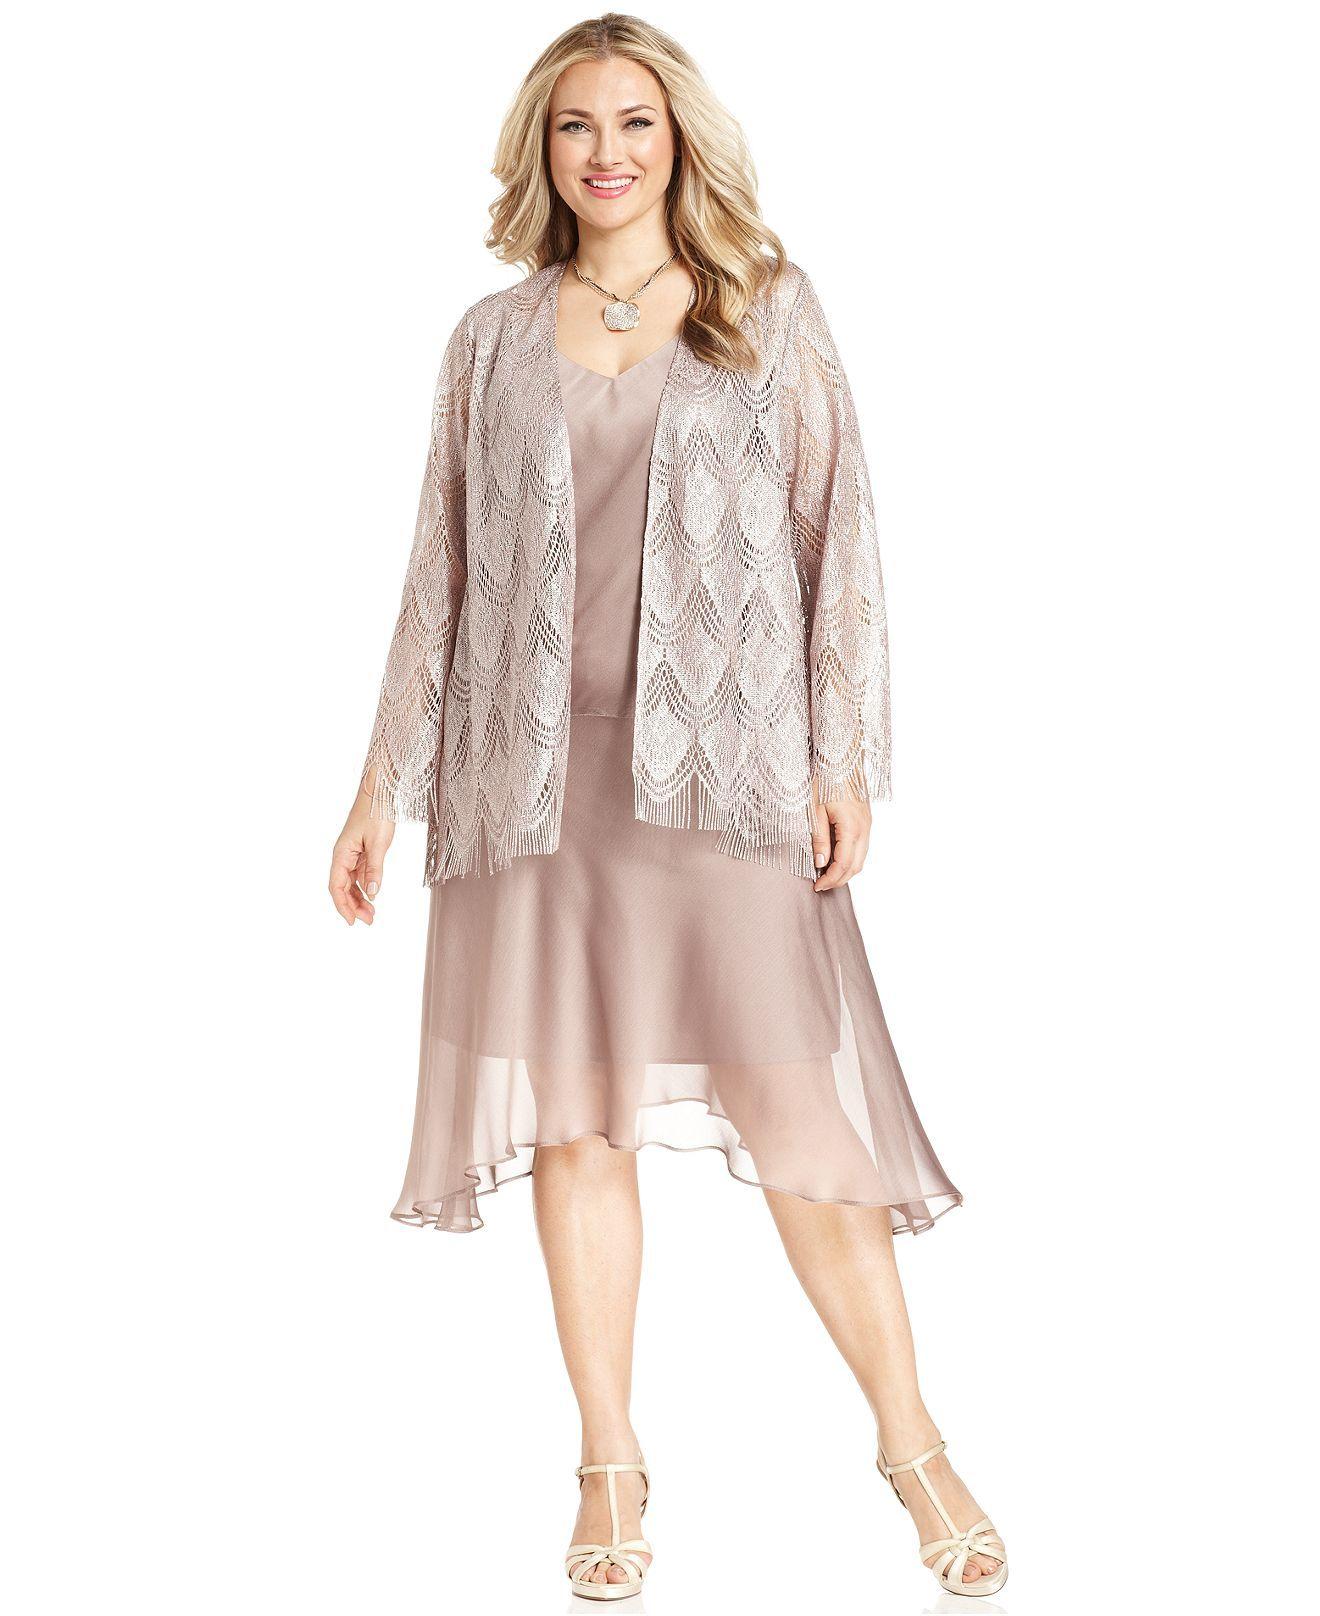 Sl Fashions Plus Size Dress And Jacket Sleeveless Satin Crochet